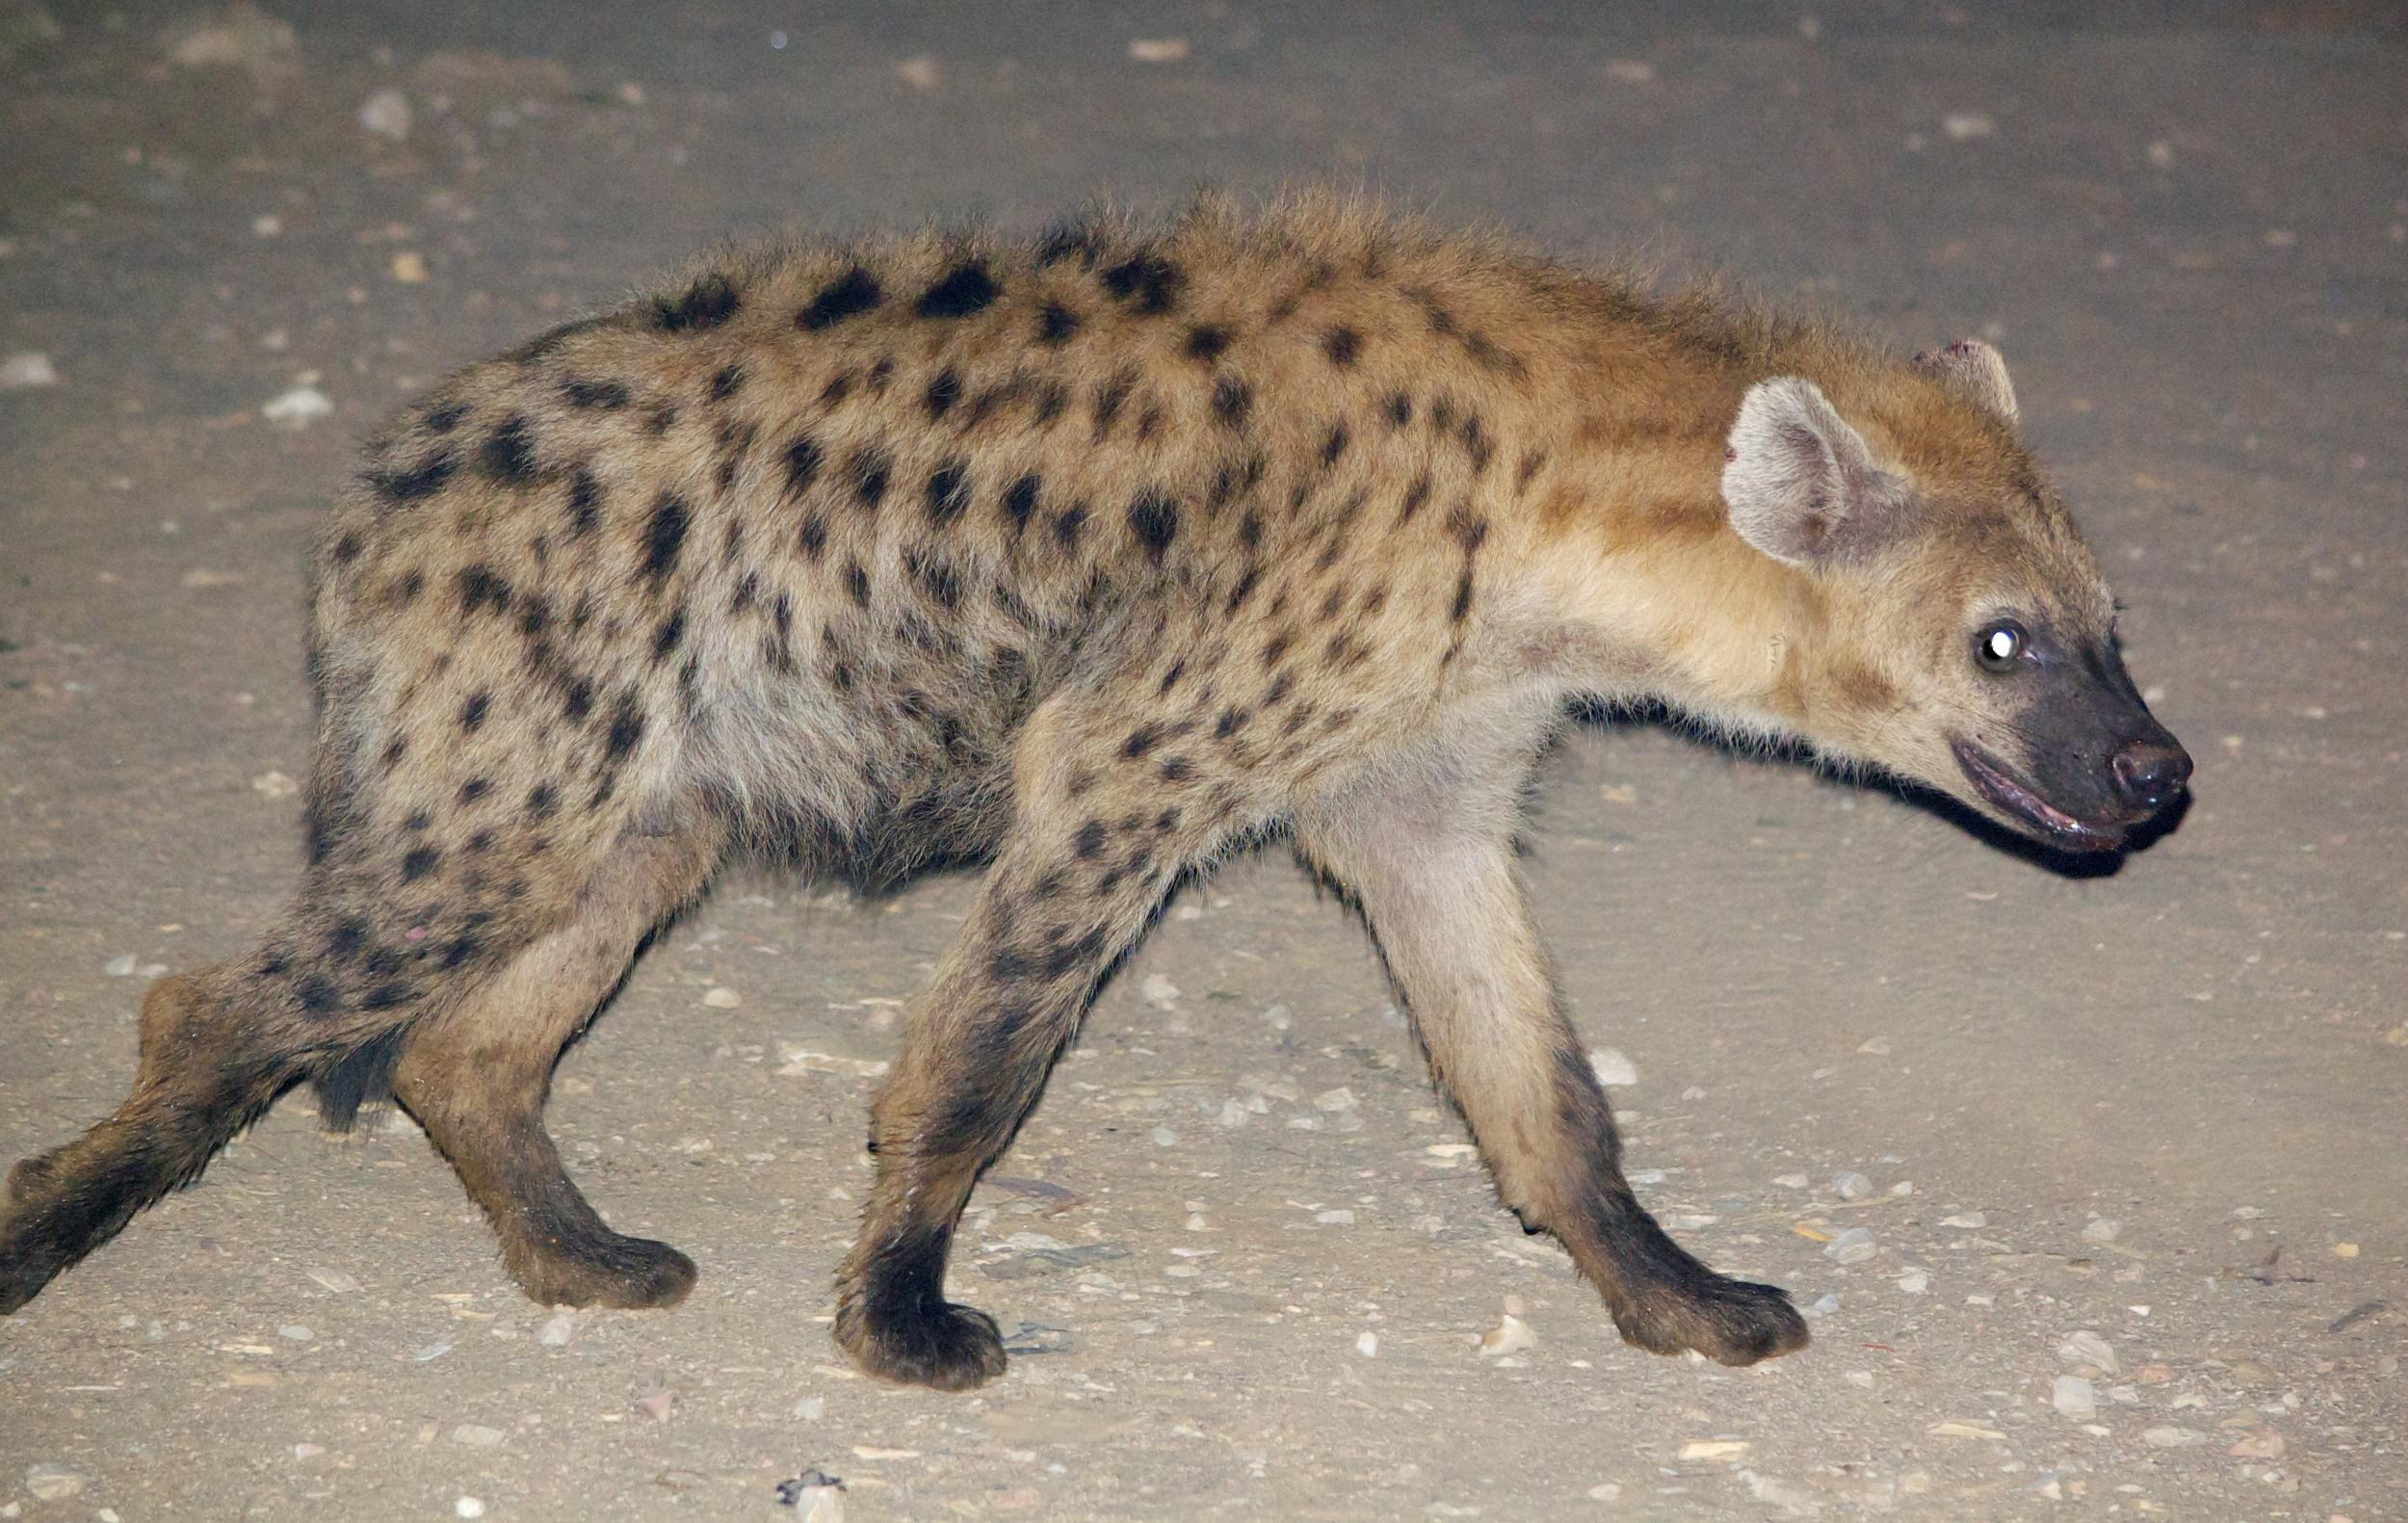 Hyenas in Harar